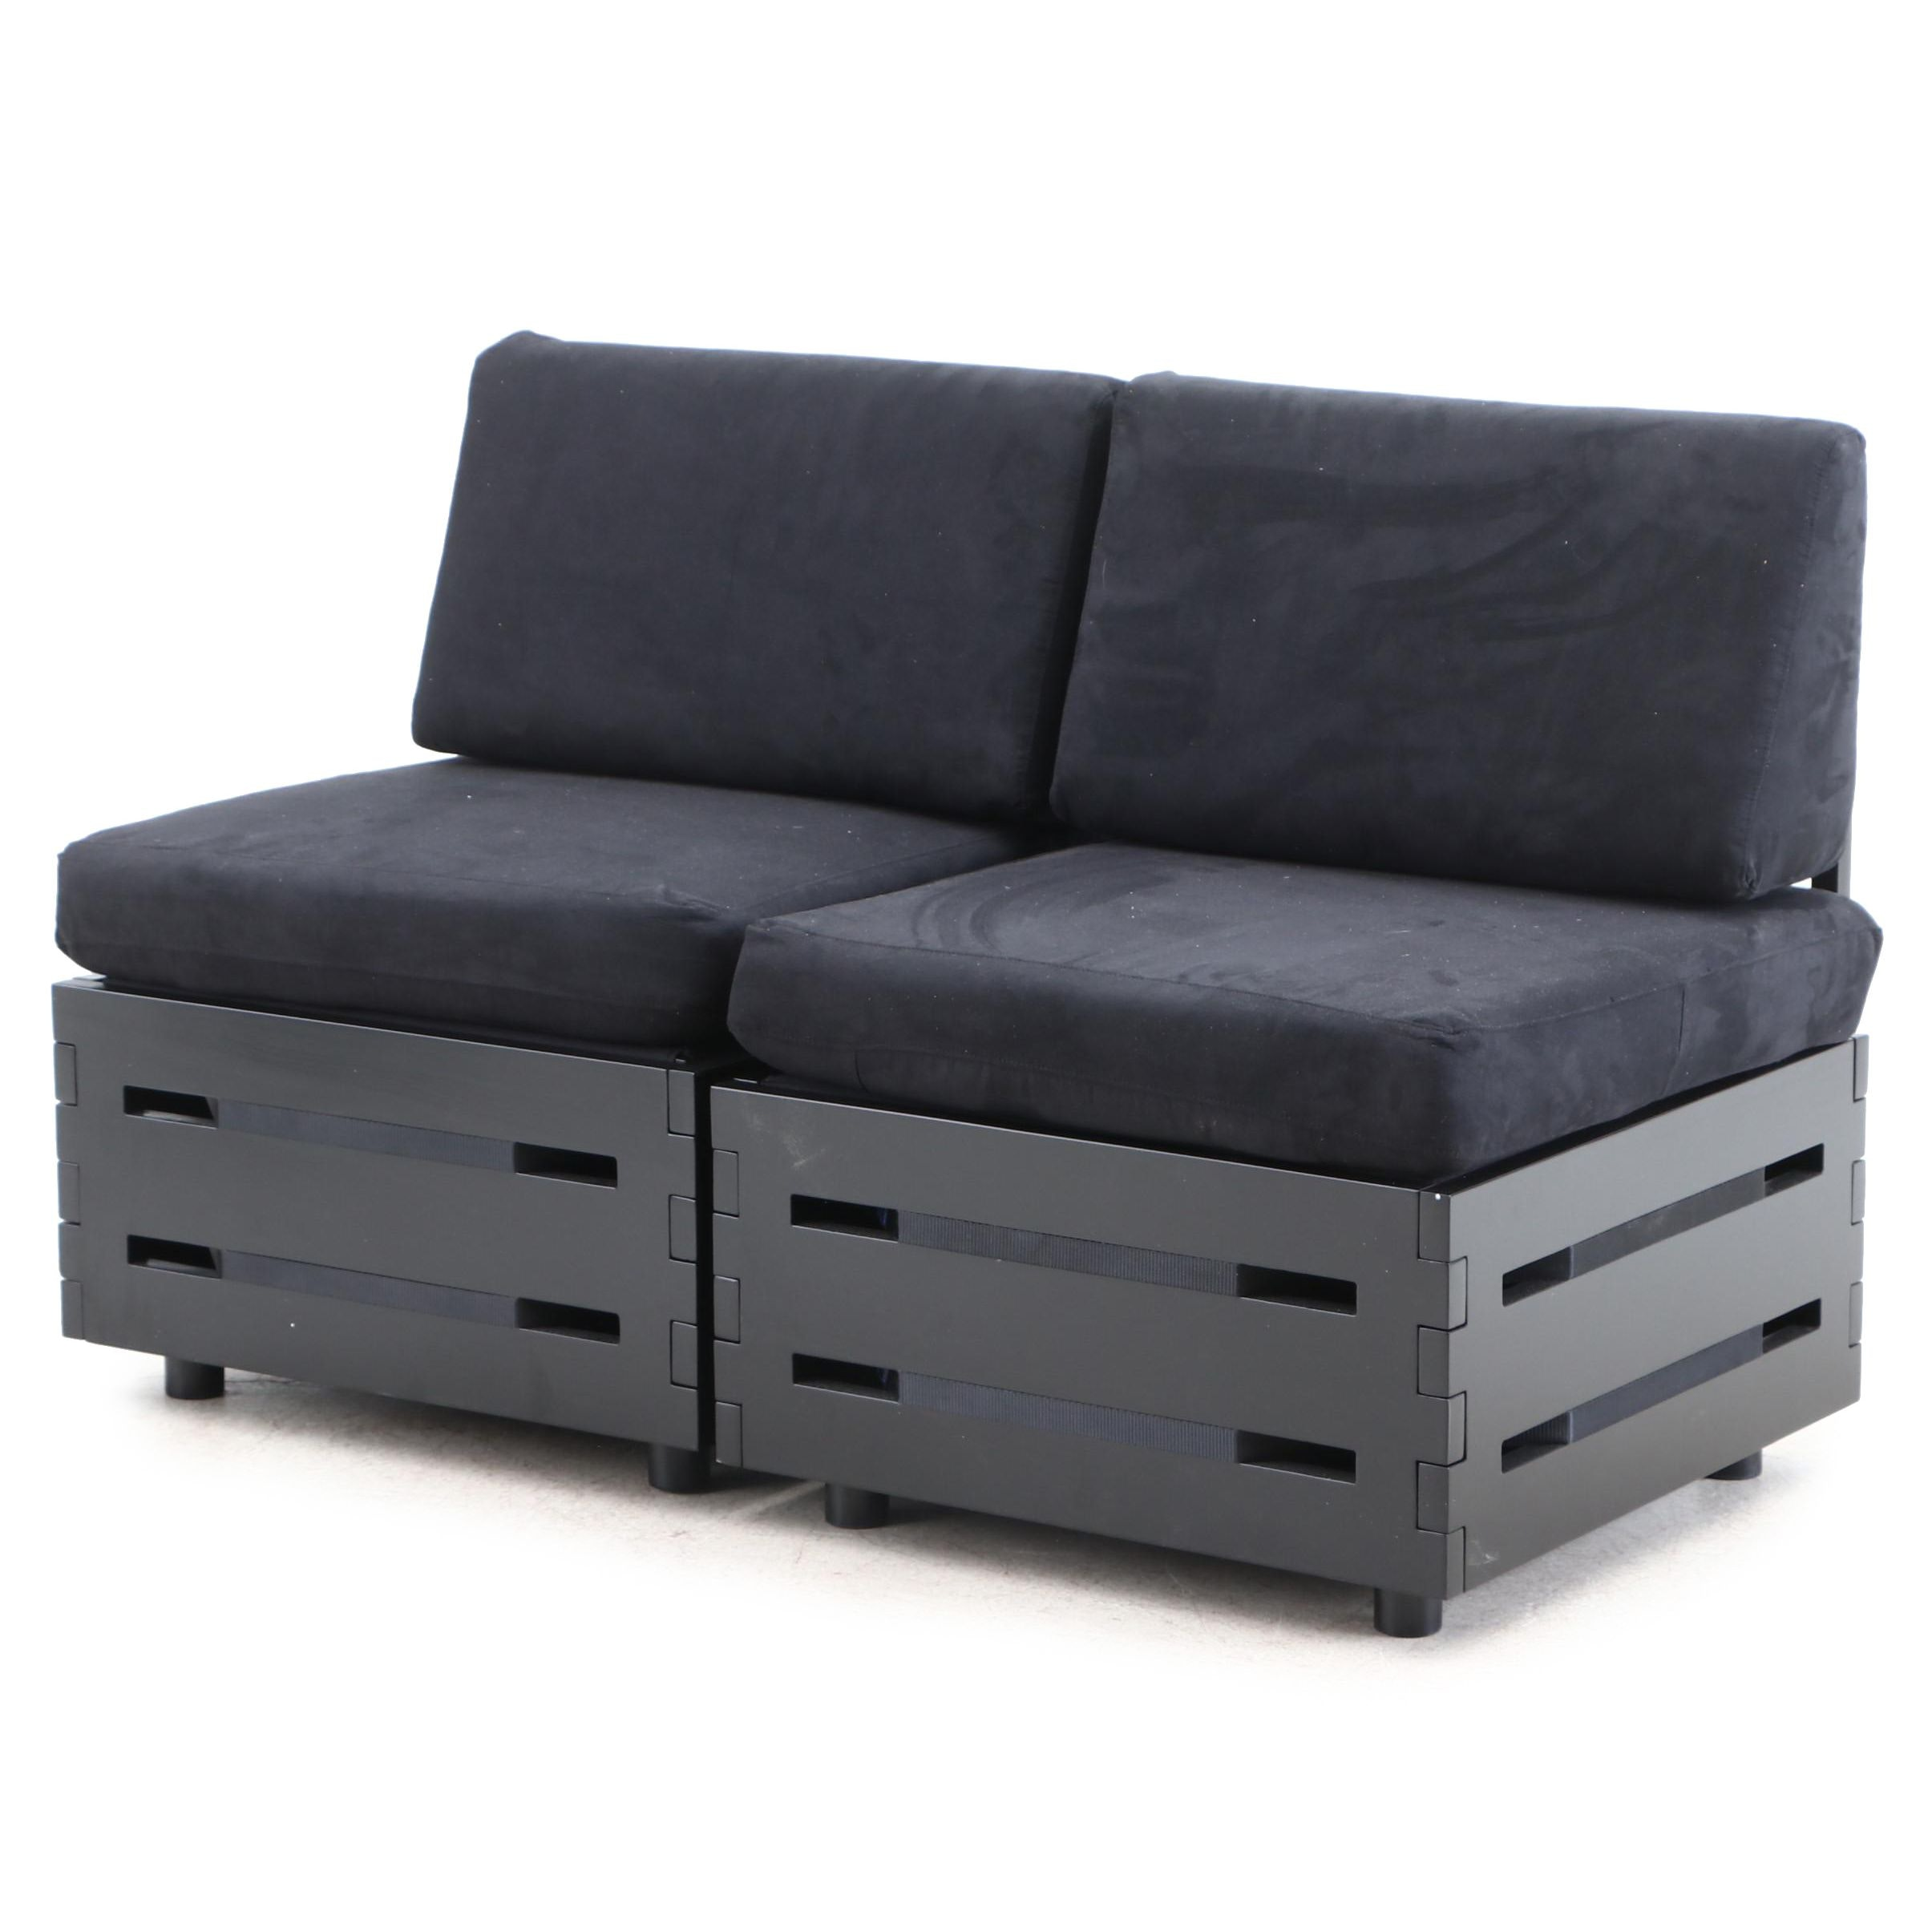 Contemporary Storage Patio Chairs